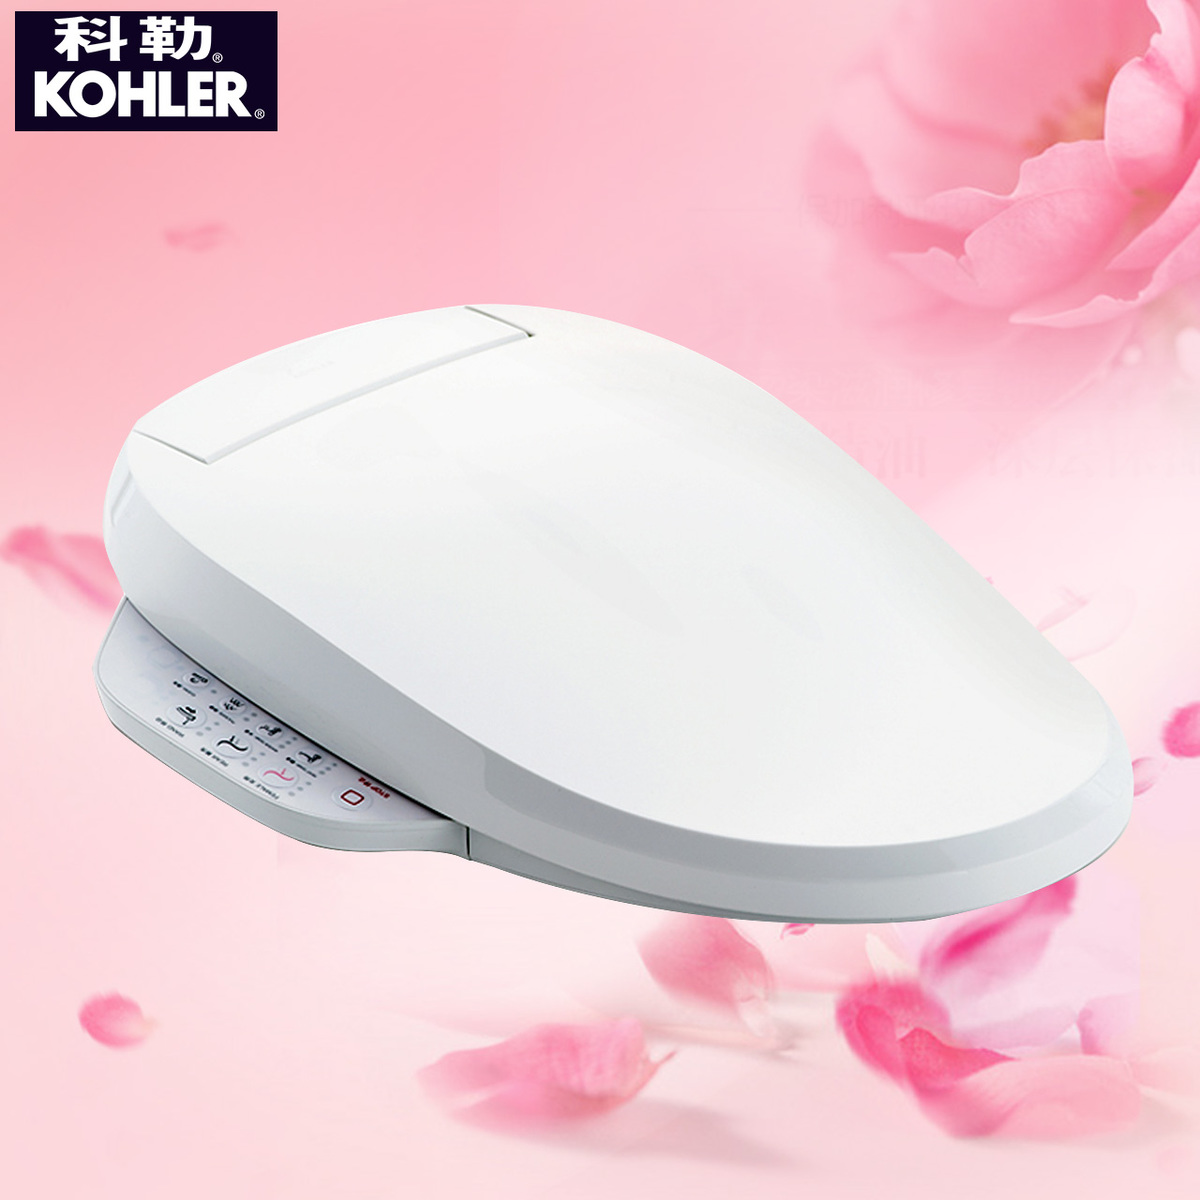 Genuine Kohler Intelligent Toilet Seat Shu Bao Electronic Cover Body K